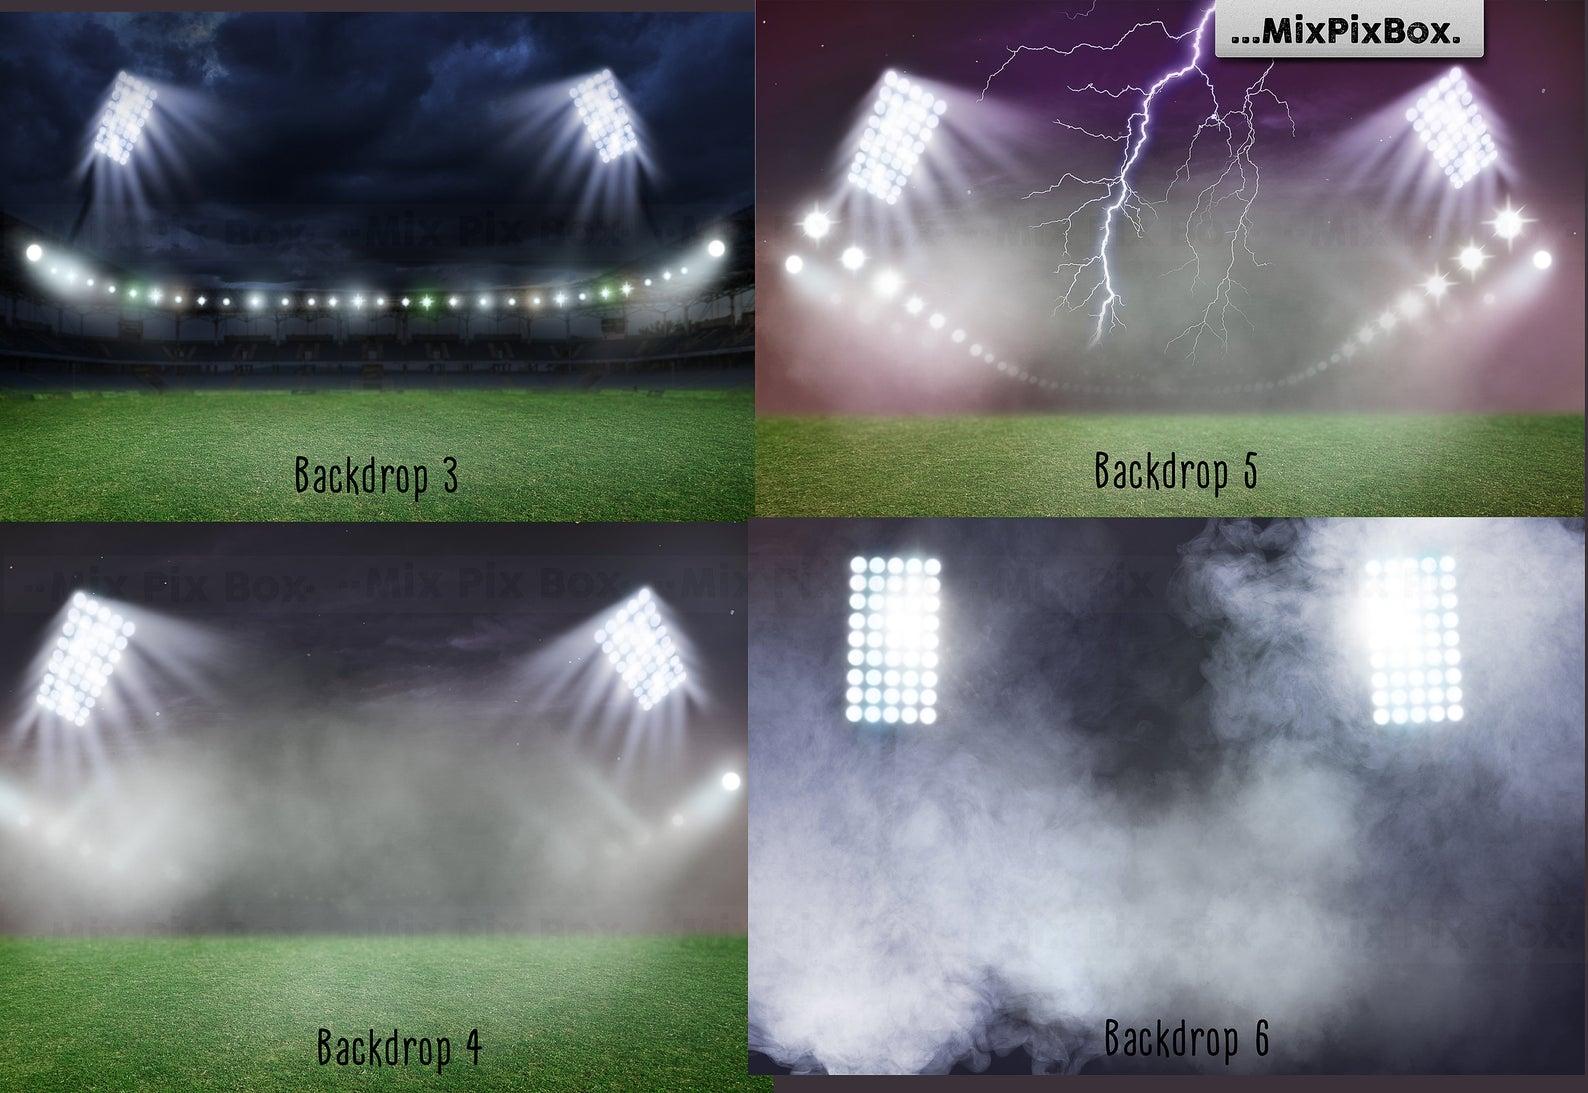 20 Stadium Lights Overlays + 6 Backdrops - 4 5